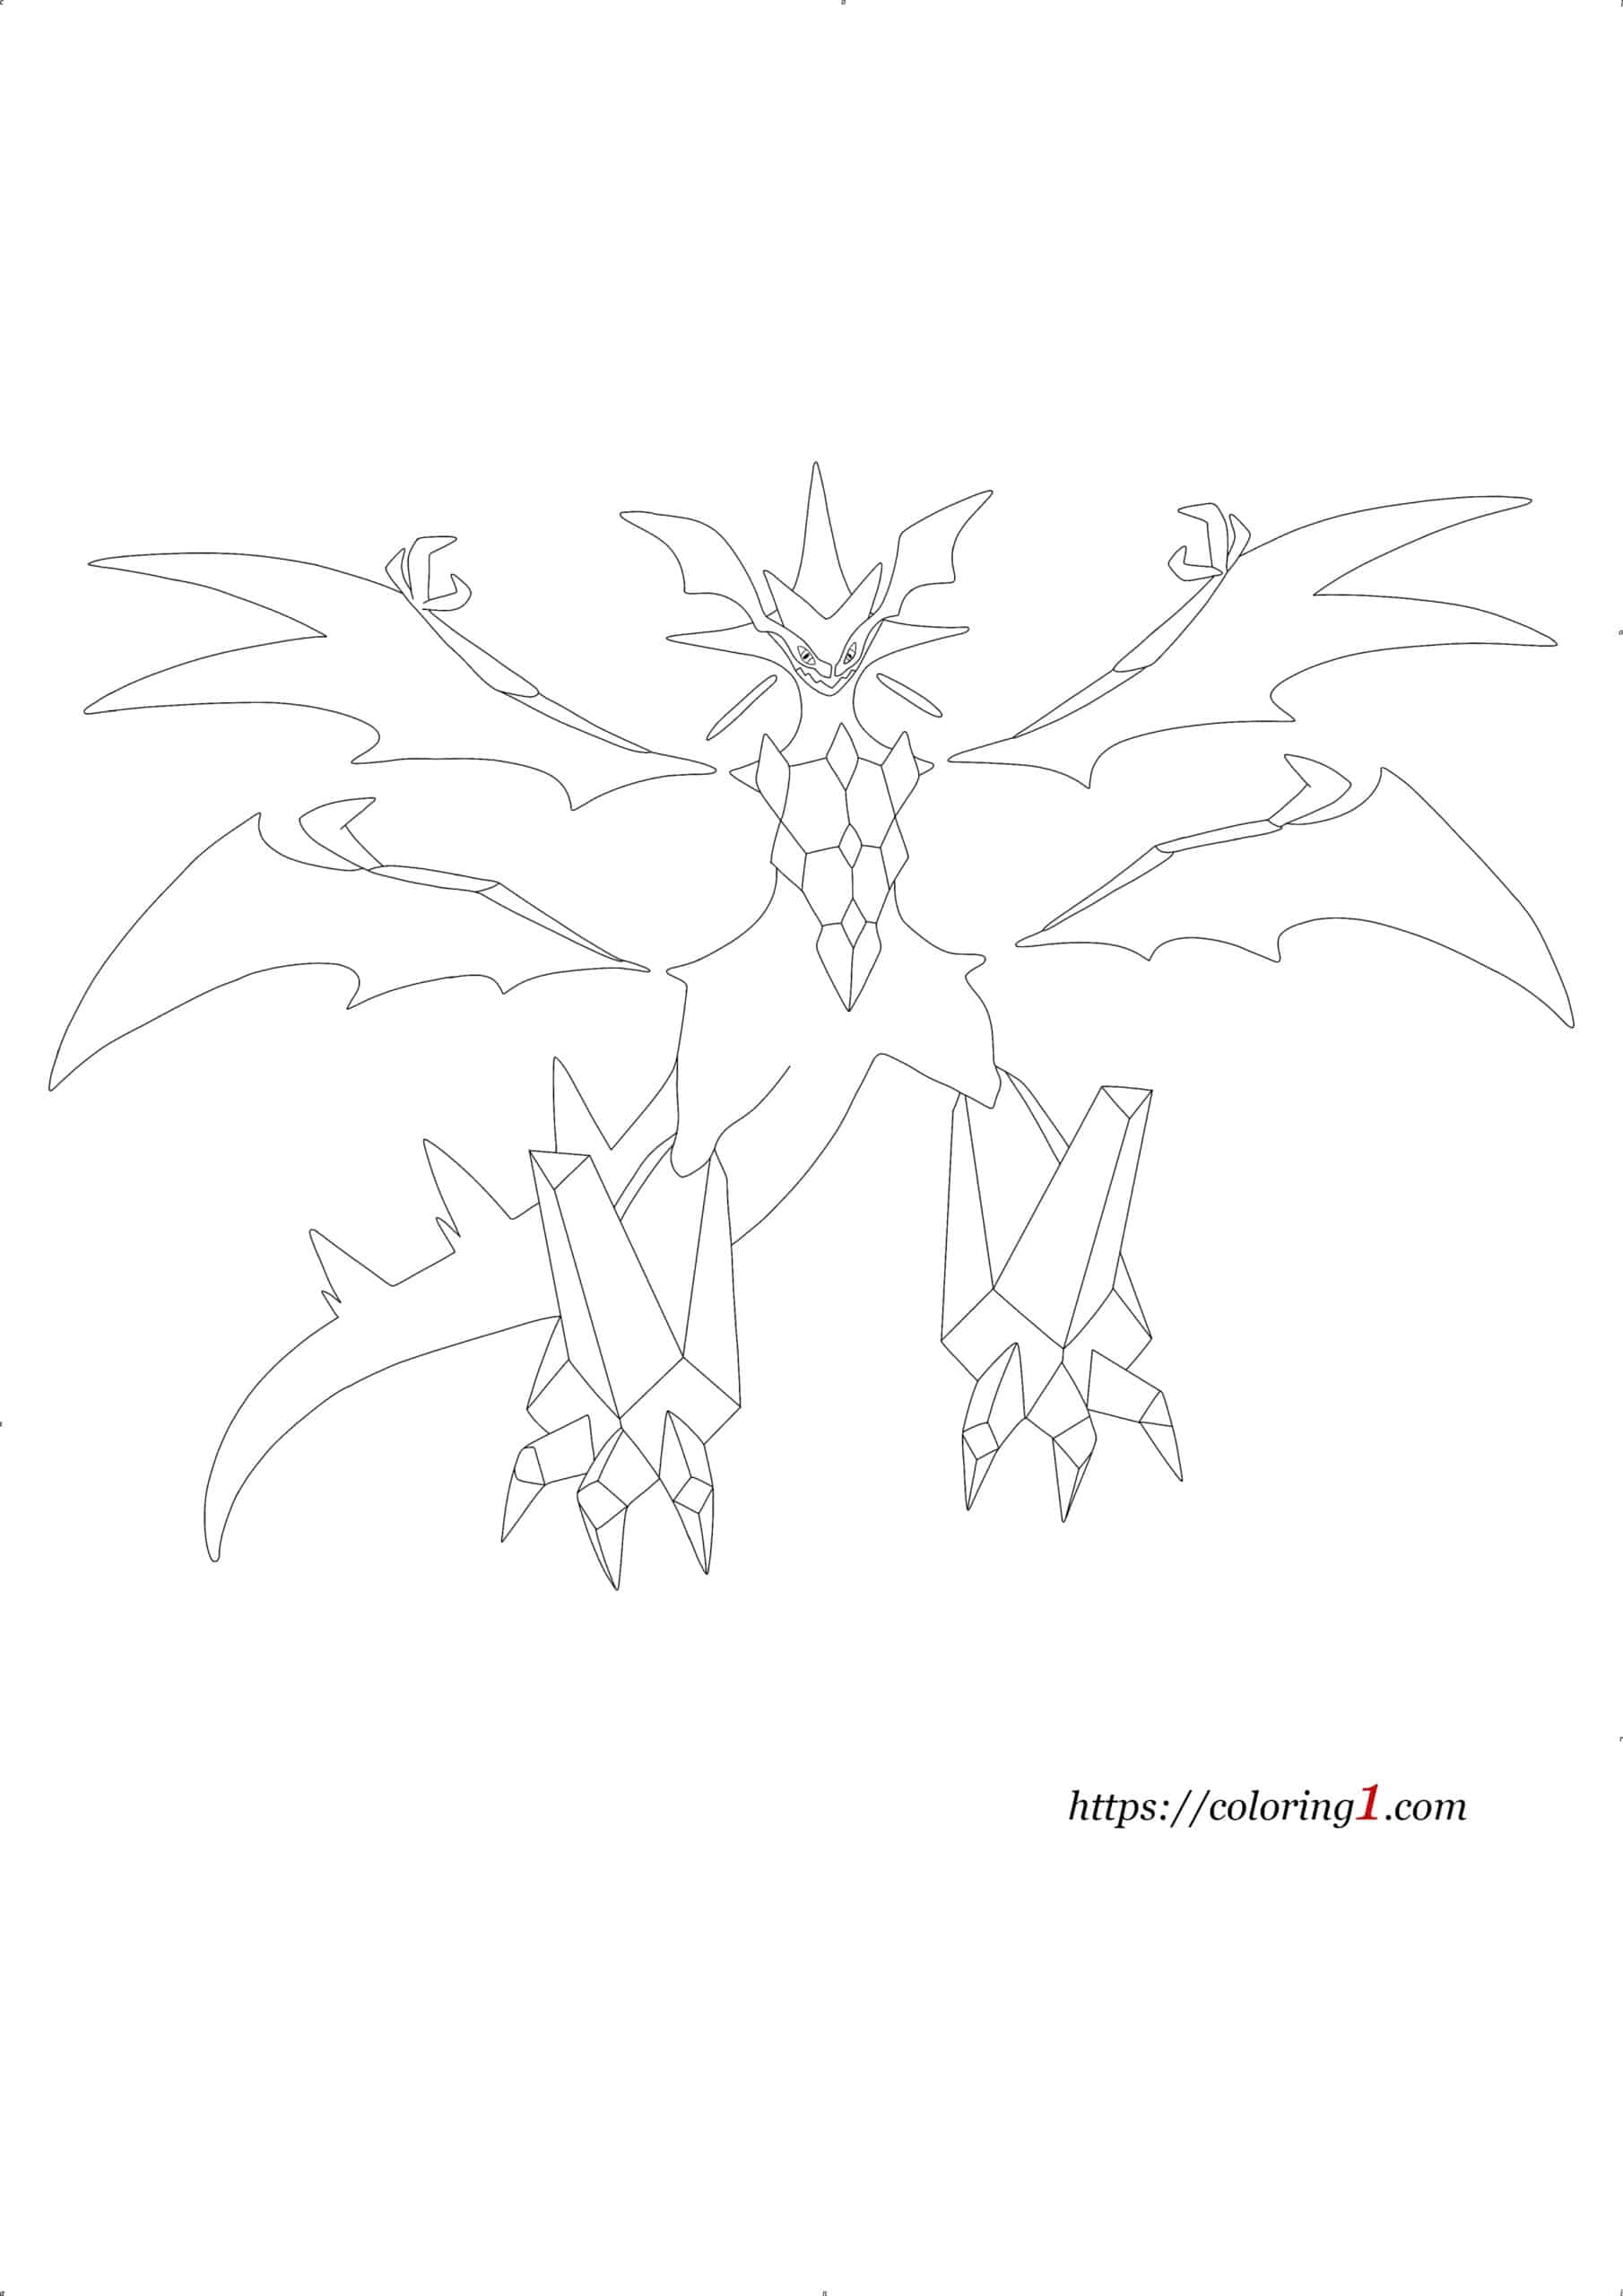 Pokemon Ultra Necrozma coloring page